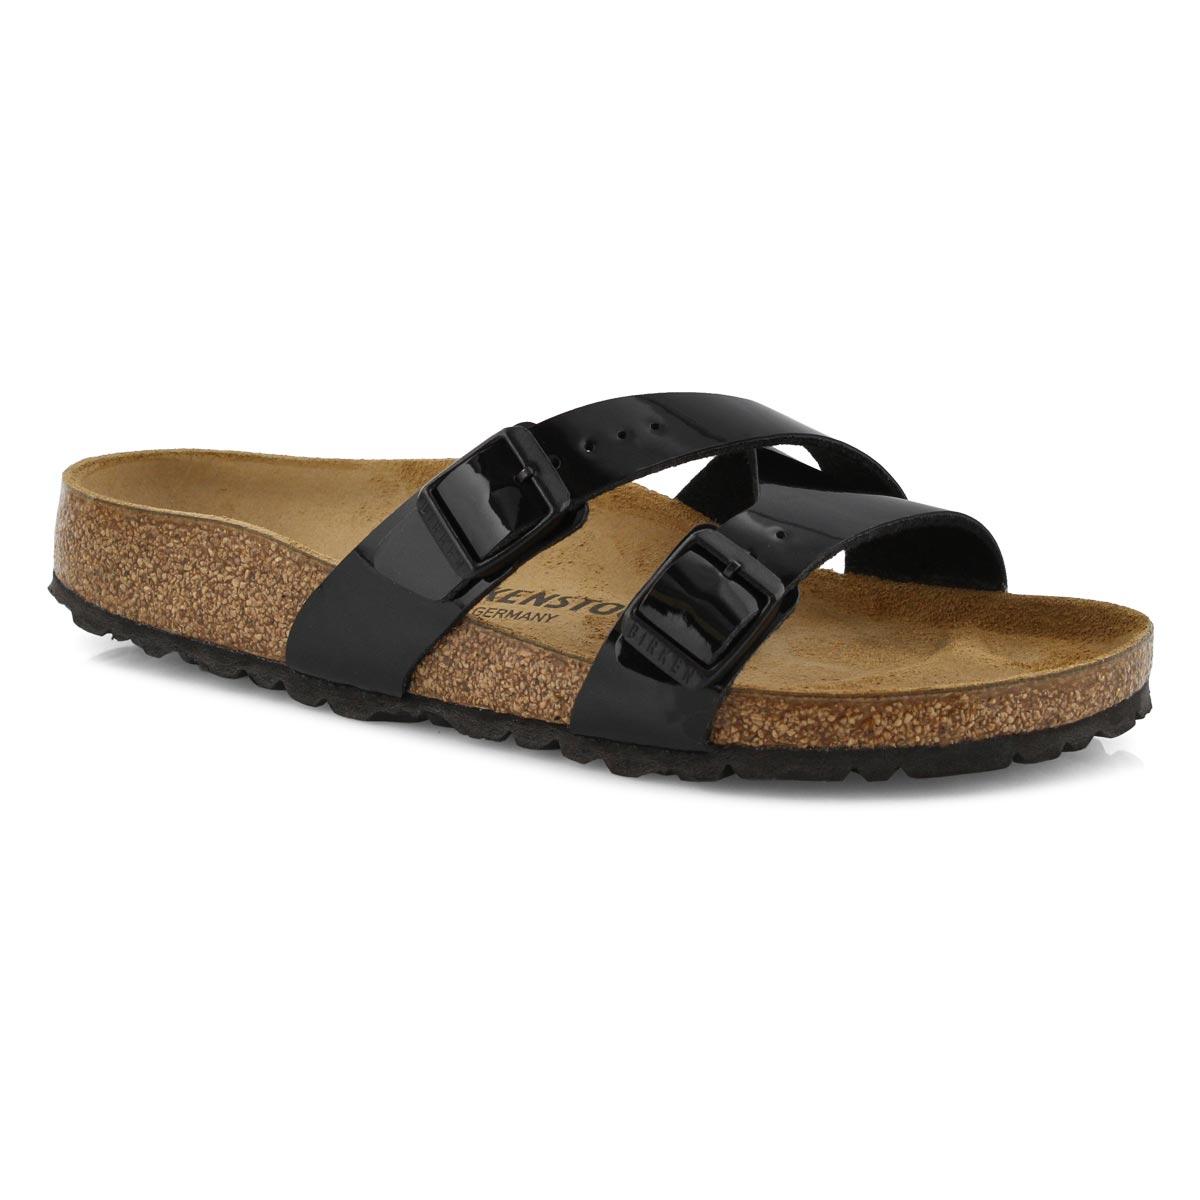 Lds Yao BF pat blk 2 stap sandal-Narrow